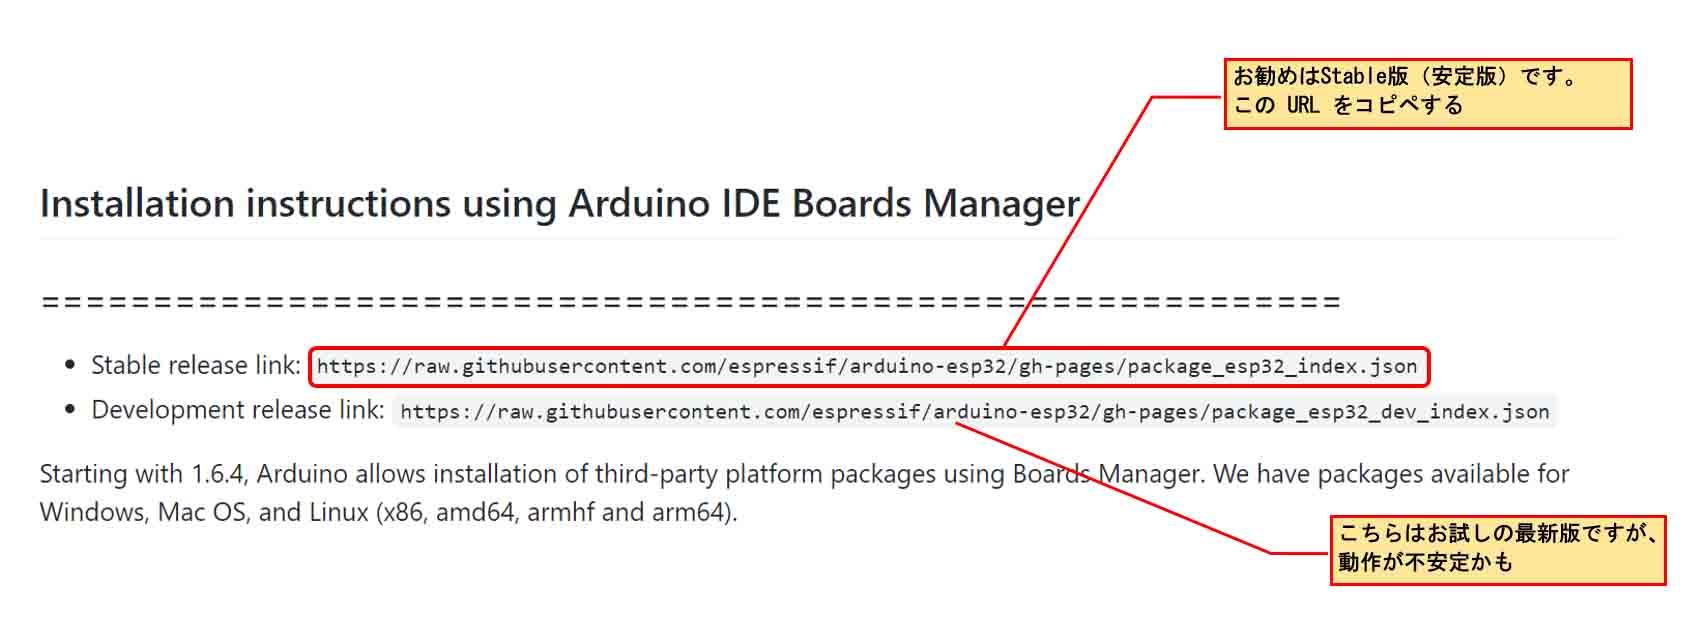 arduino_esp32_stable02_01.jpg